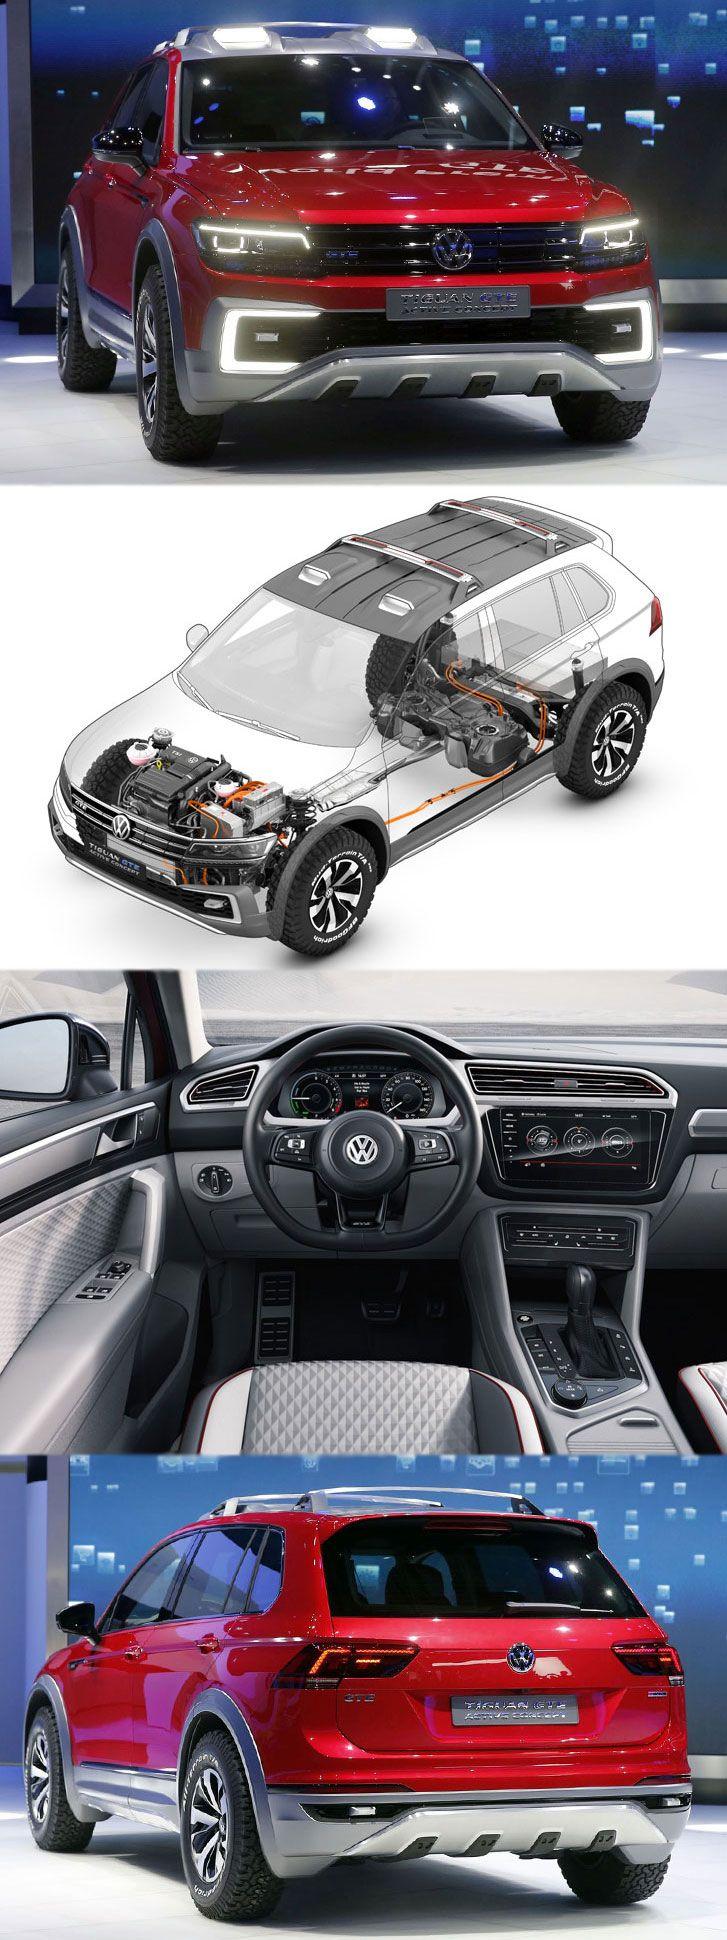 Volkswagen shown tiguan gte active concept in detroit read more details at http